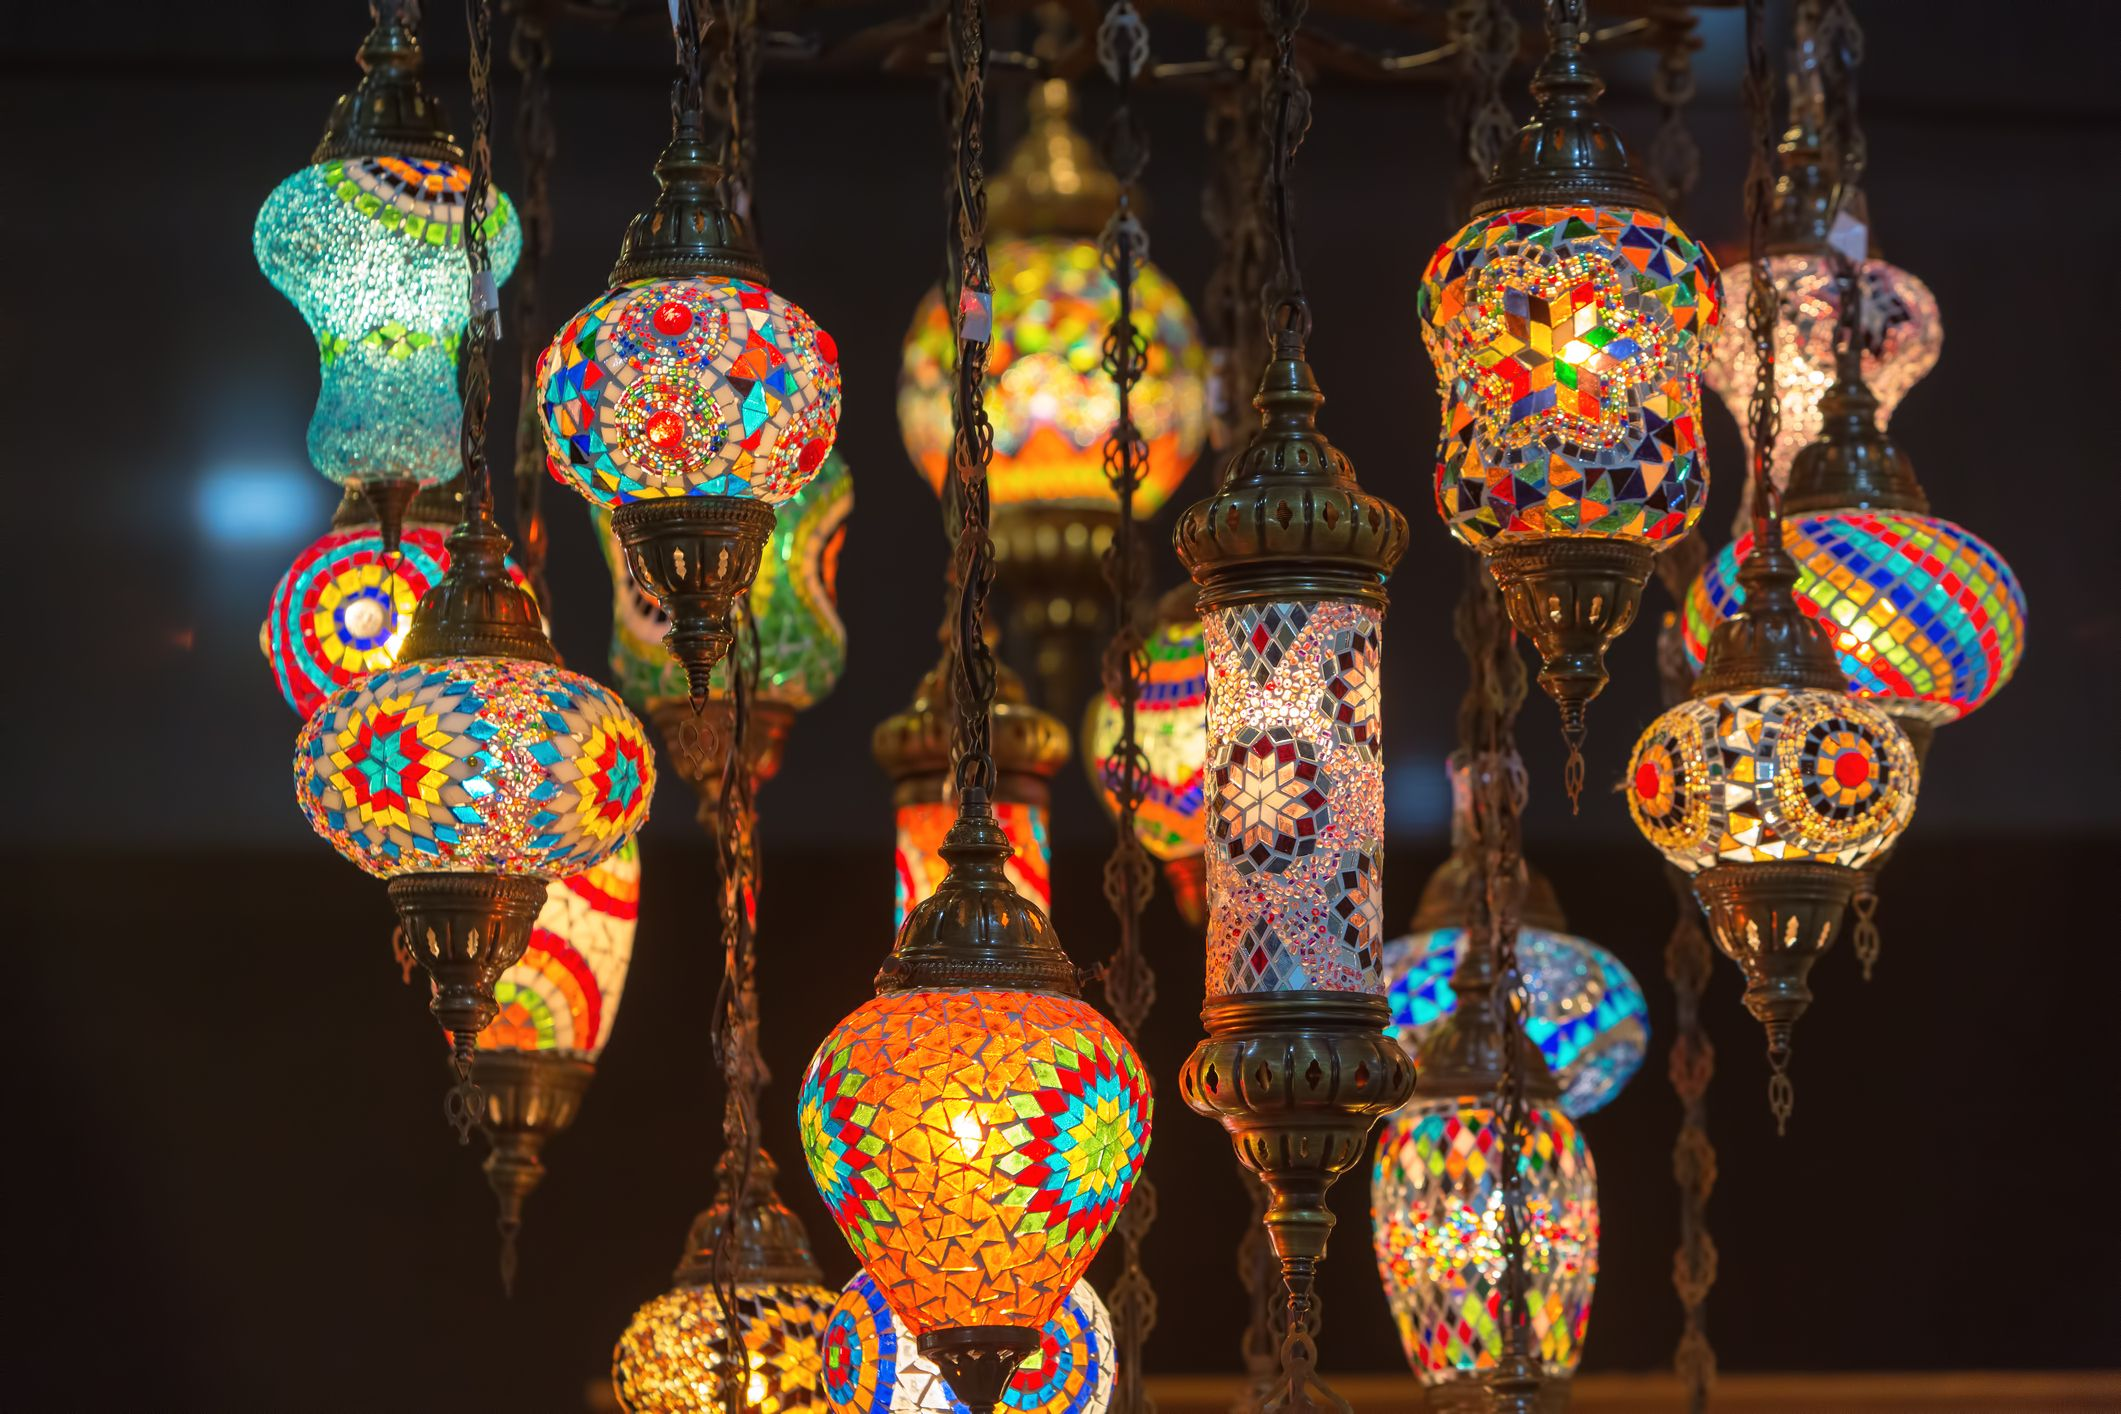 Decoraci n estilo marroqu hogarmania - Como decorar tulipas de lamparas ...